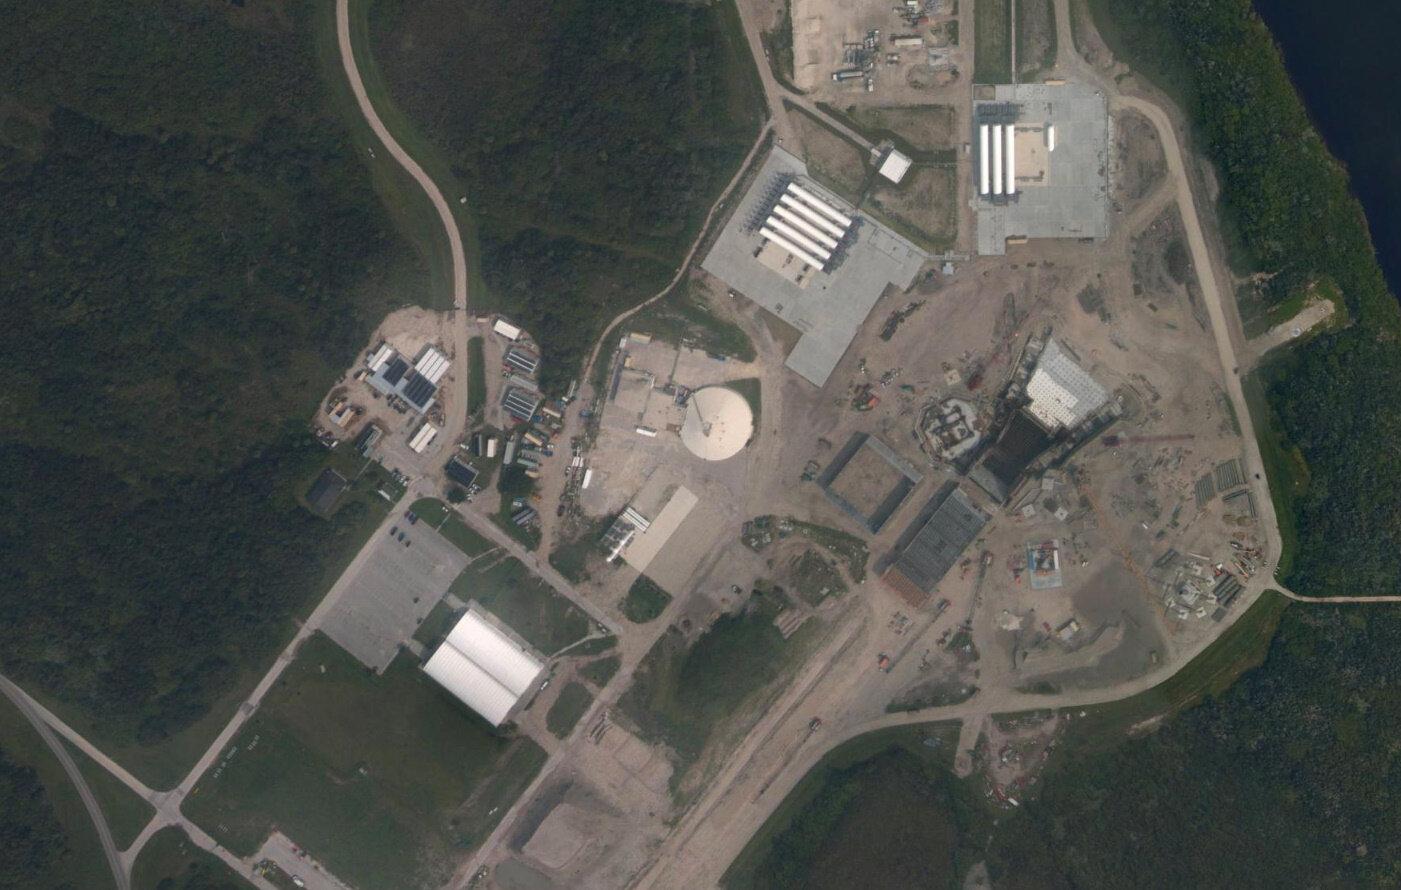 A satellite image of SC-36